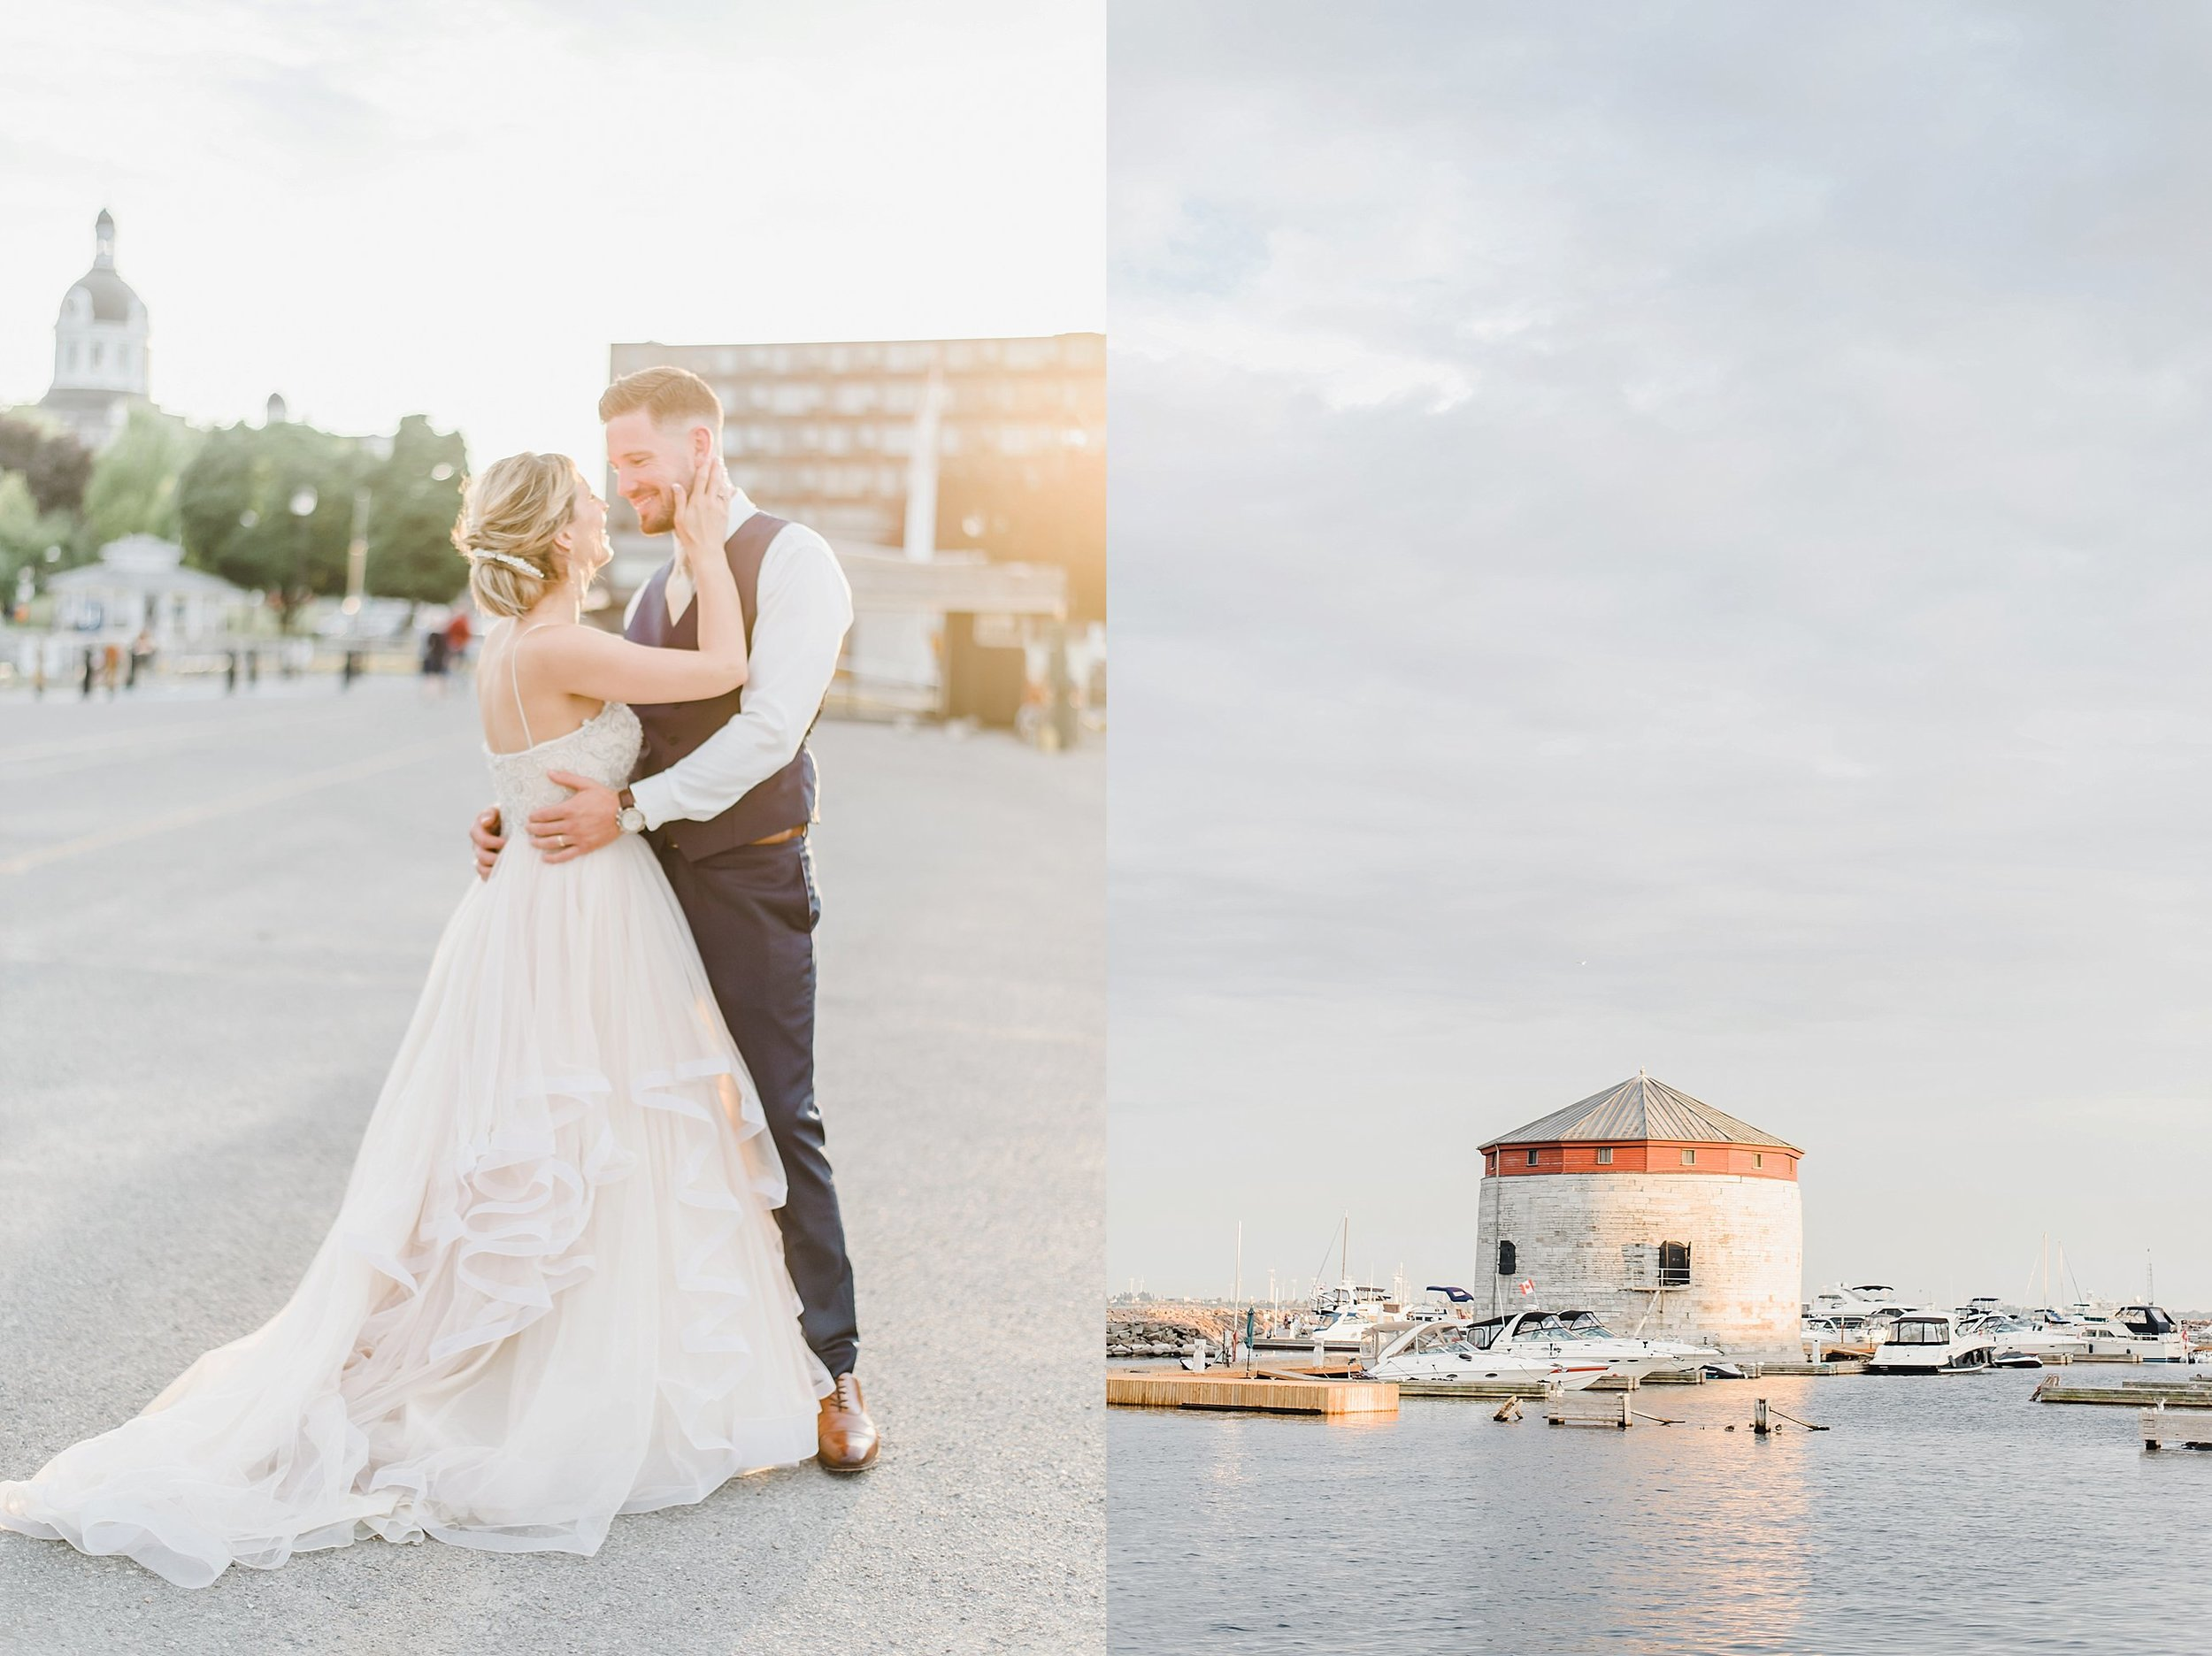 light airy indie fine art ottawa wedding photographer | Ali and Batoul Photography_0240.jpg